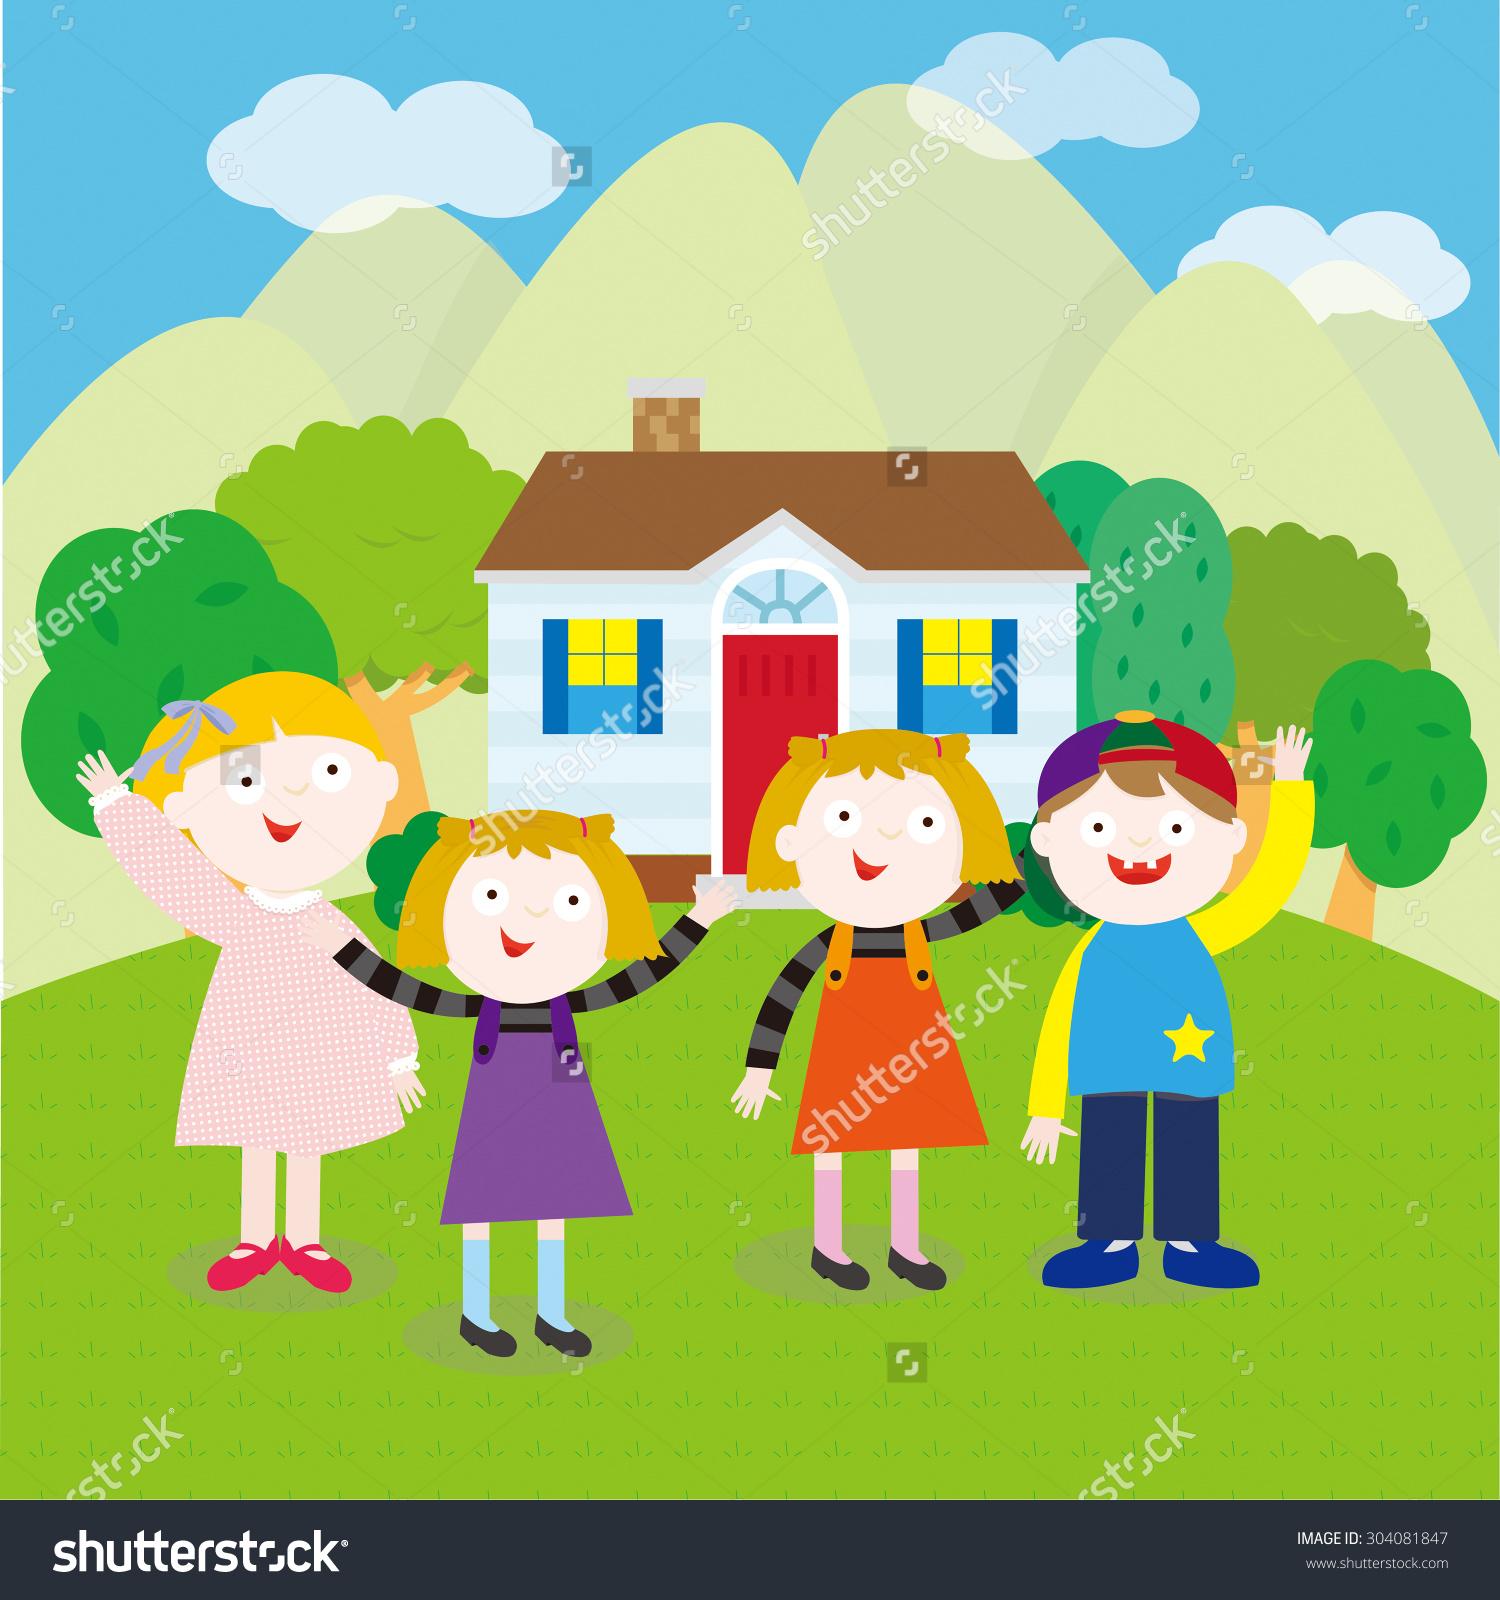 3 girls 1 boy clipart clip art freeuse stock 3 Girls 1 Boy Standing Front Stock Vector 304081847 - Shutterstock clip art freeuse stock